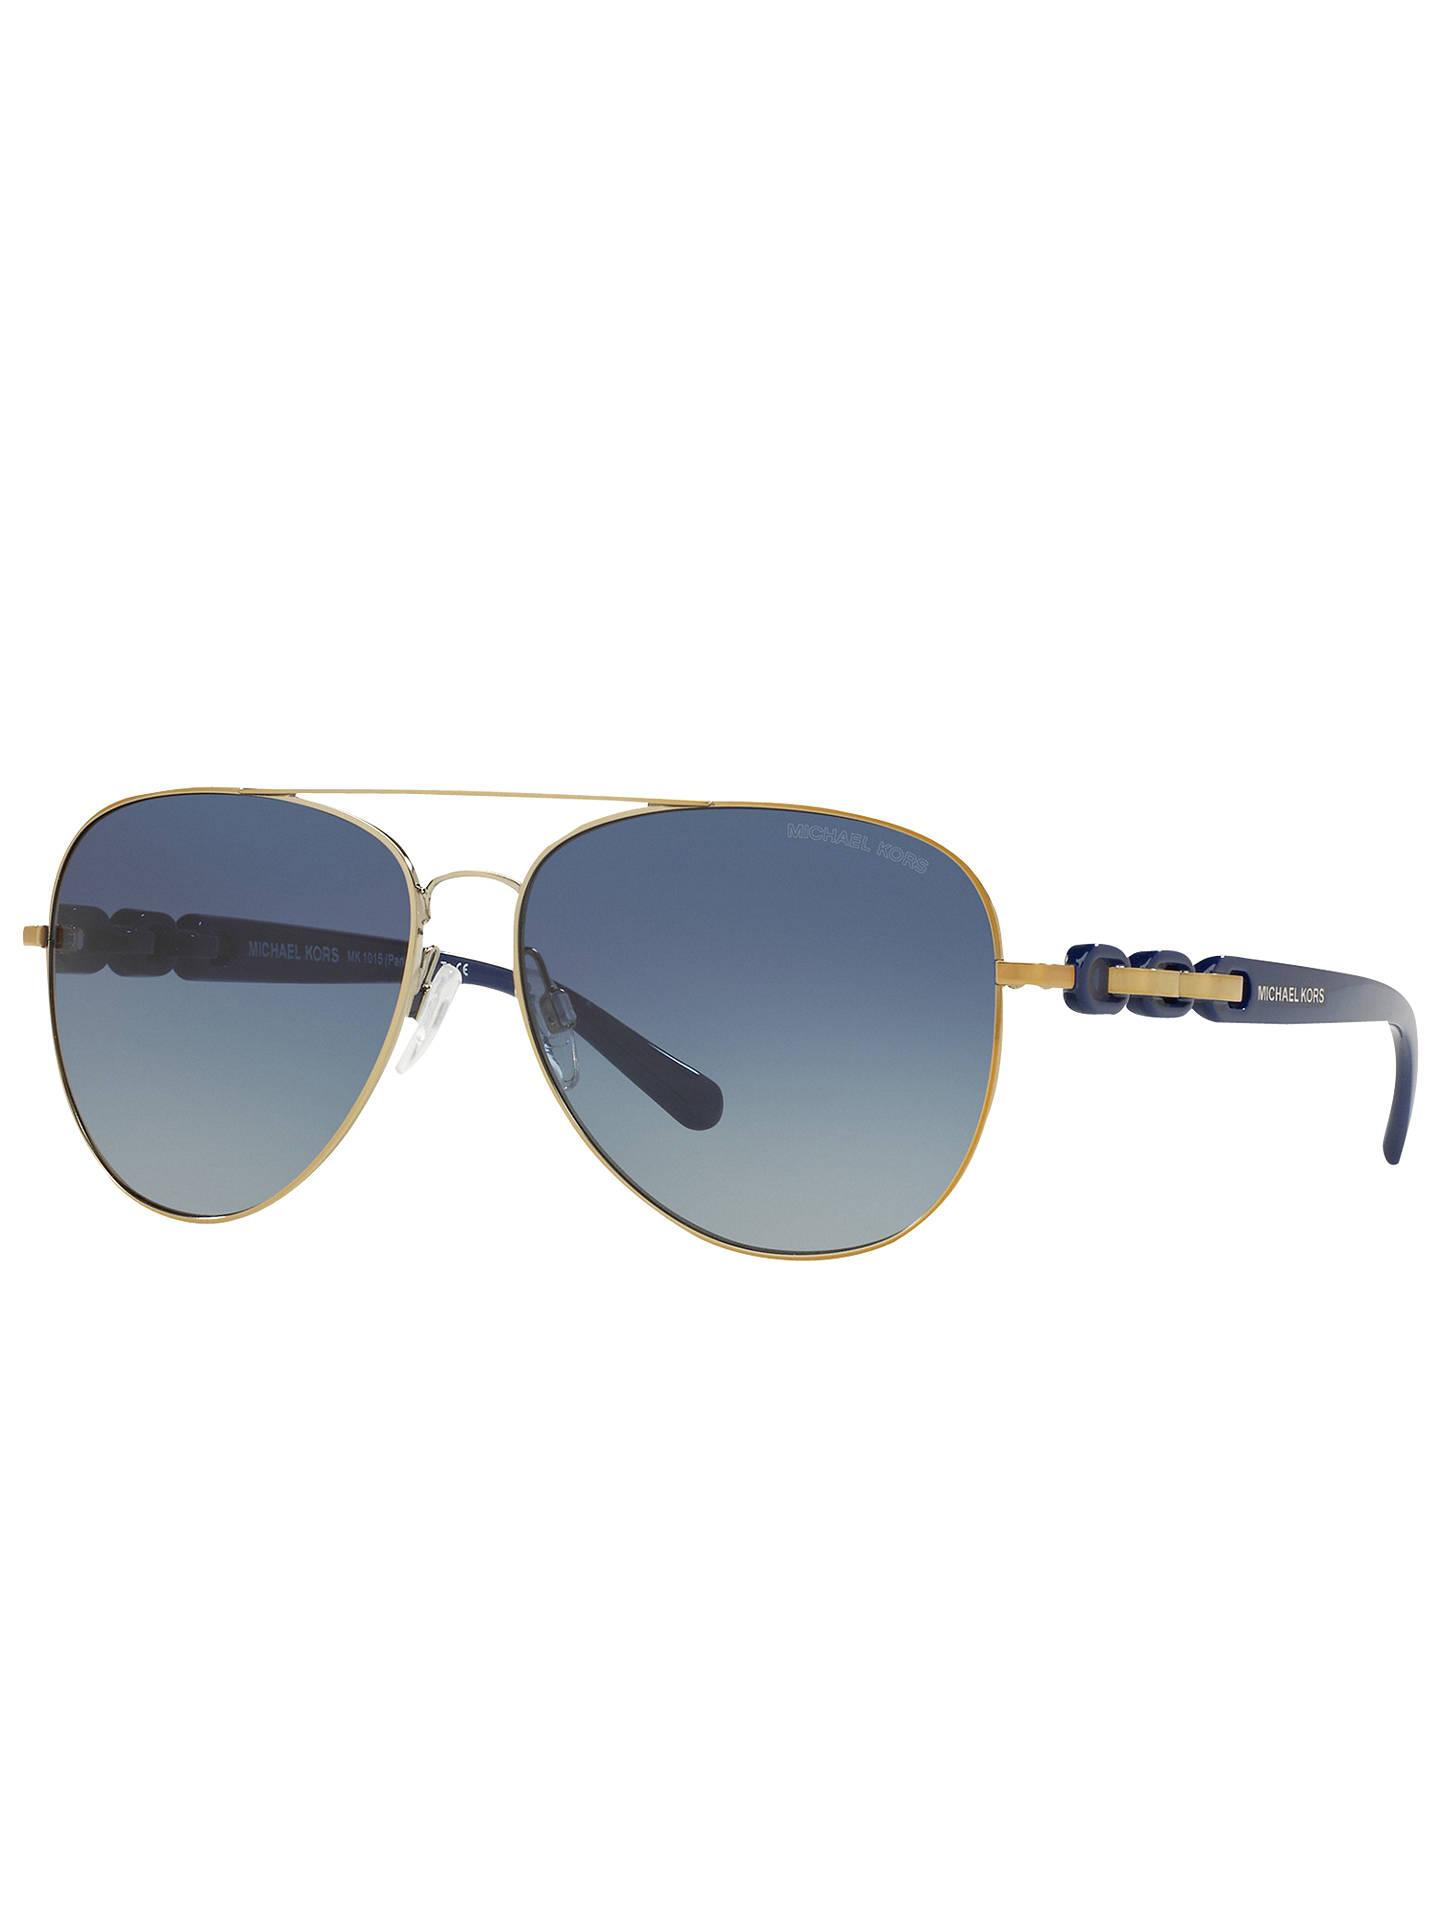 d9d1f869a Buy Michael Kors MK1015 Pandora I Aviator Sunglasses, Gold/Blue Gradient  Online at johnlewis ...